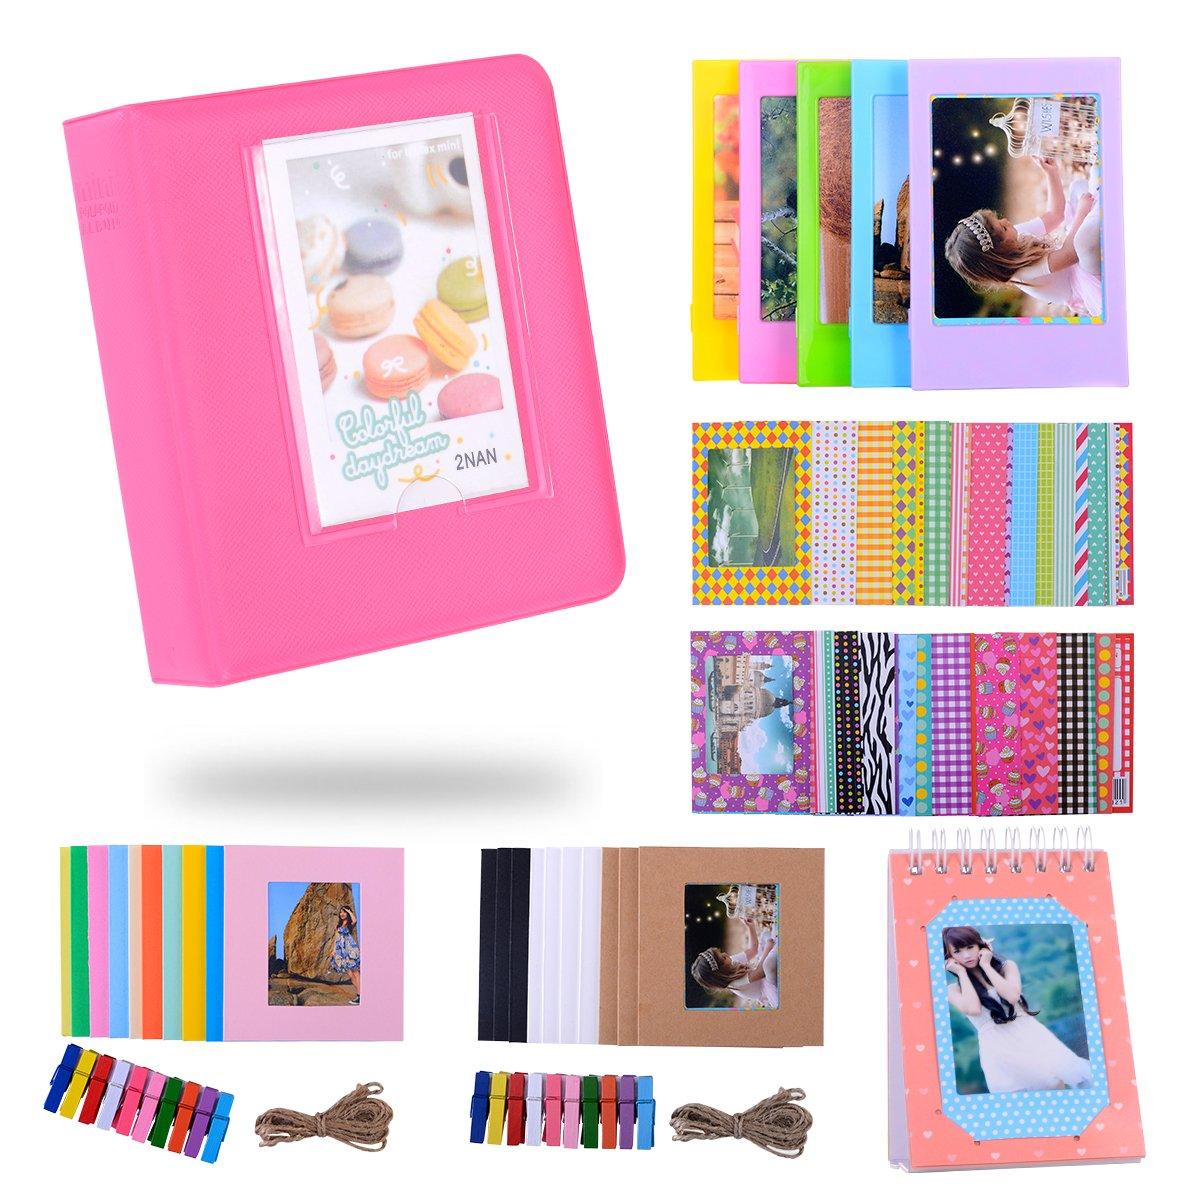 Kaka Film Rahmen Bundles Set Fr Hp Sprocket Portable Fotodrucker Fujifilm Instax Mini Album Kamera Polaroid 2nan Colorful Zip Mobiler Drucker Snap Instant Digitalkamera Mit Frames